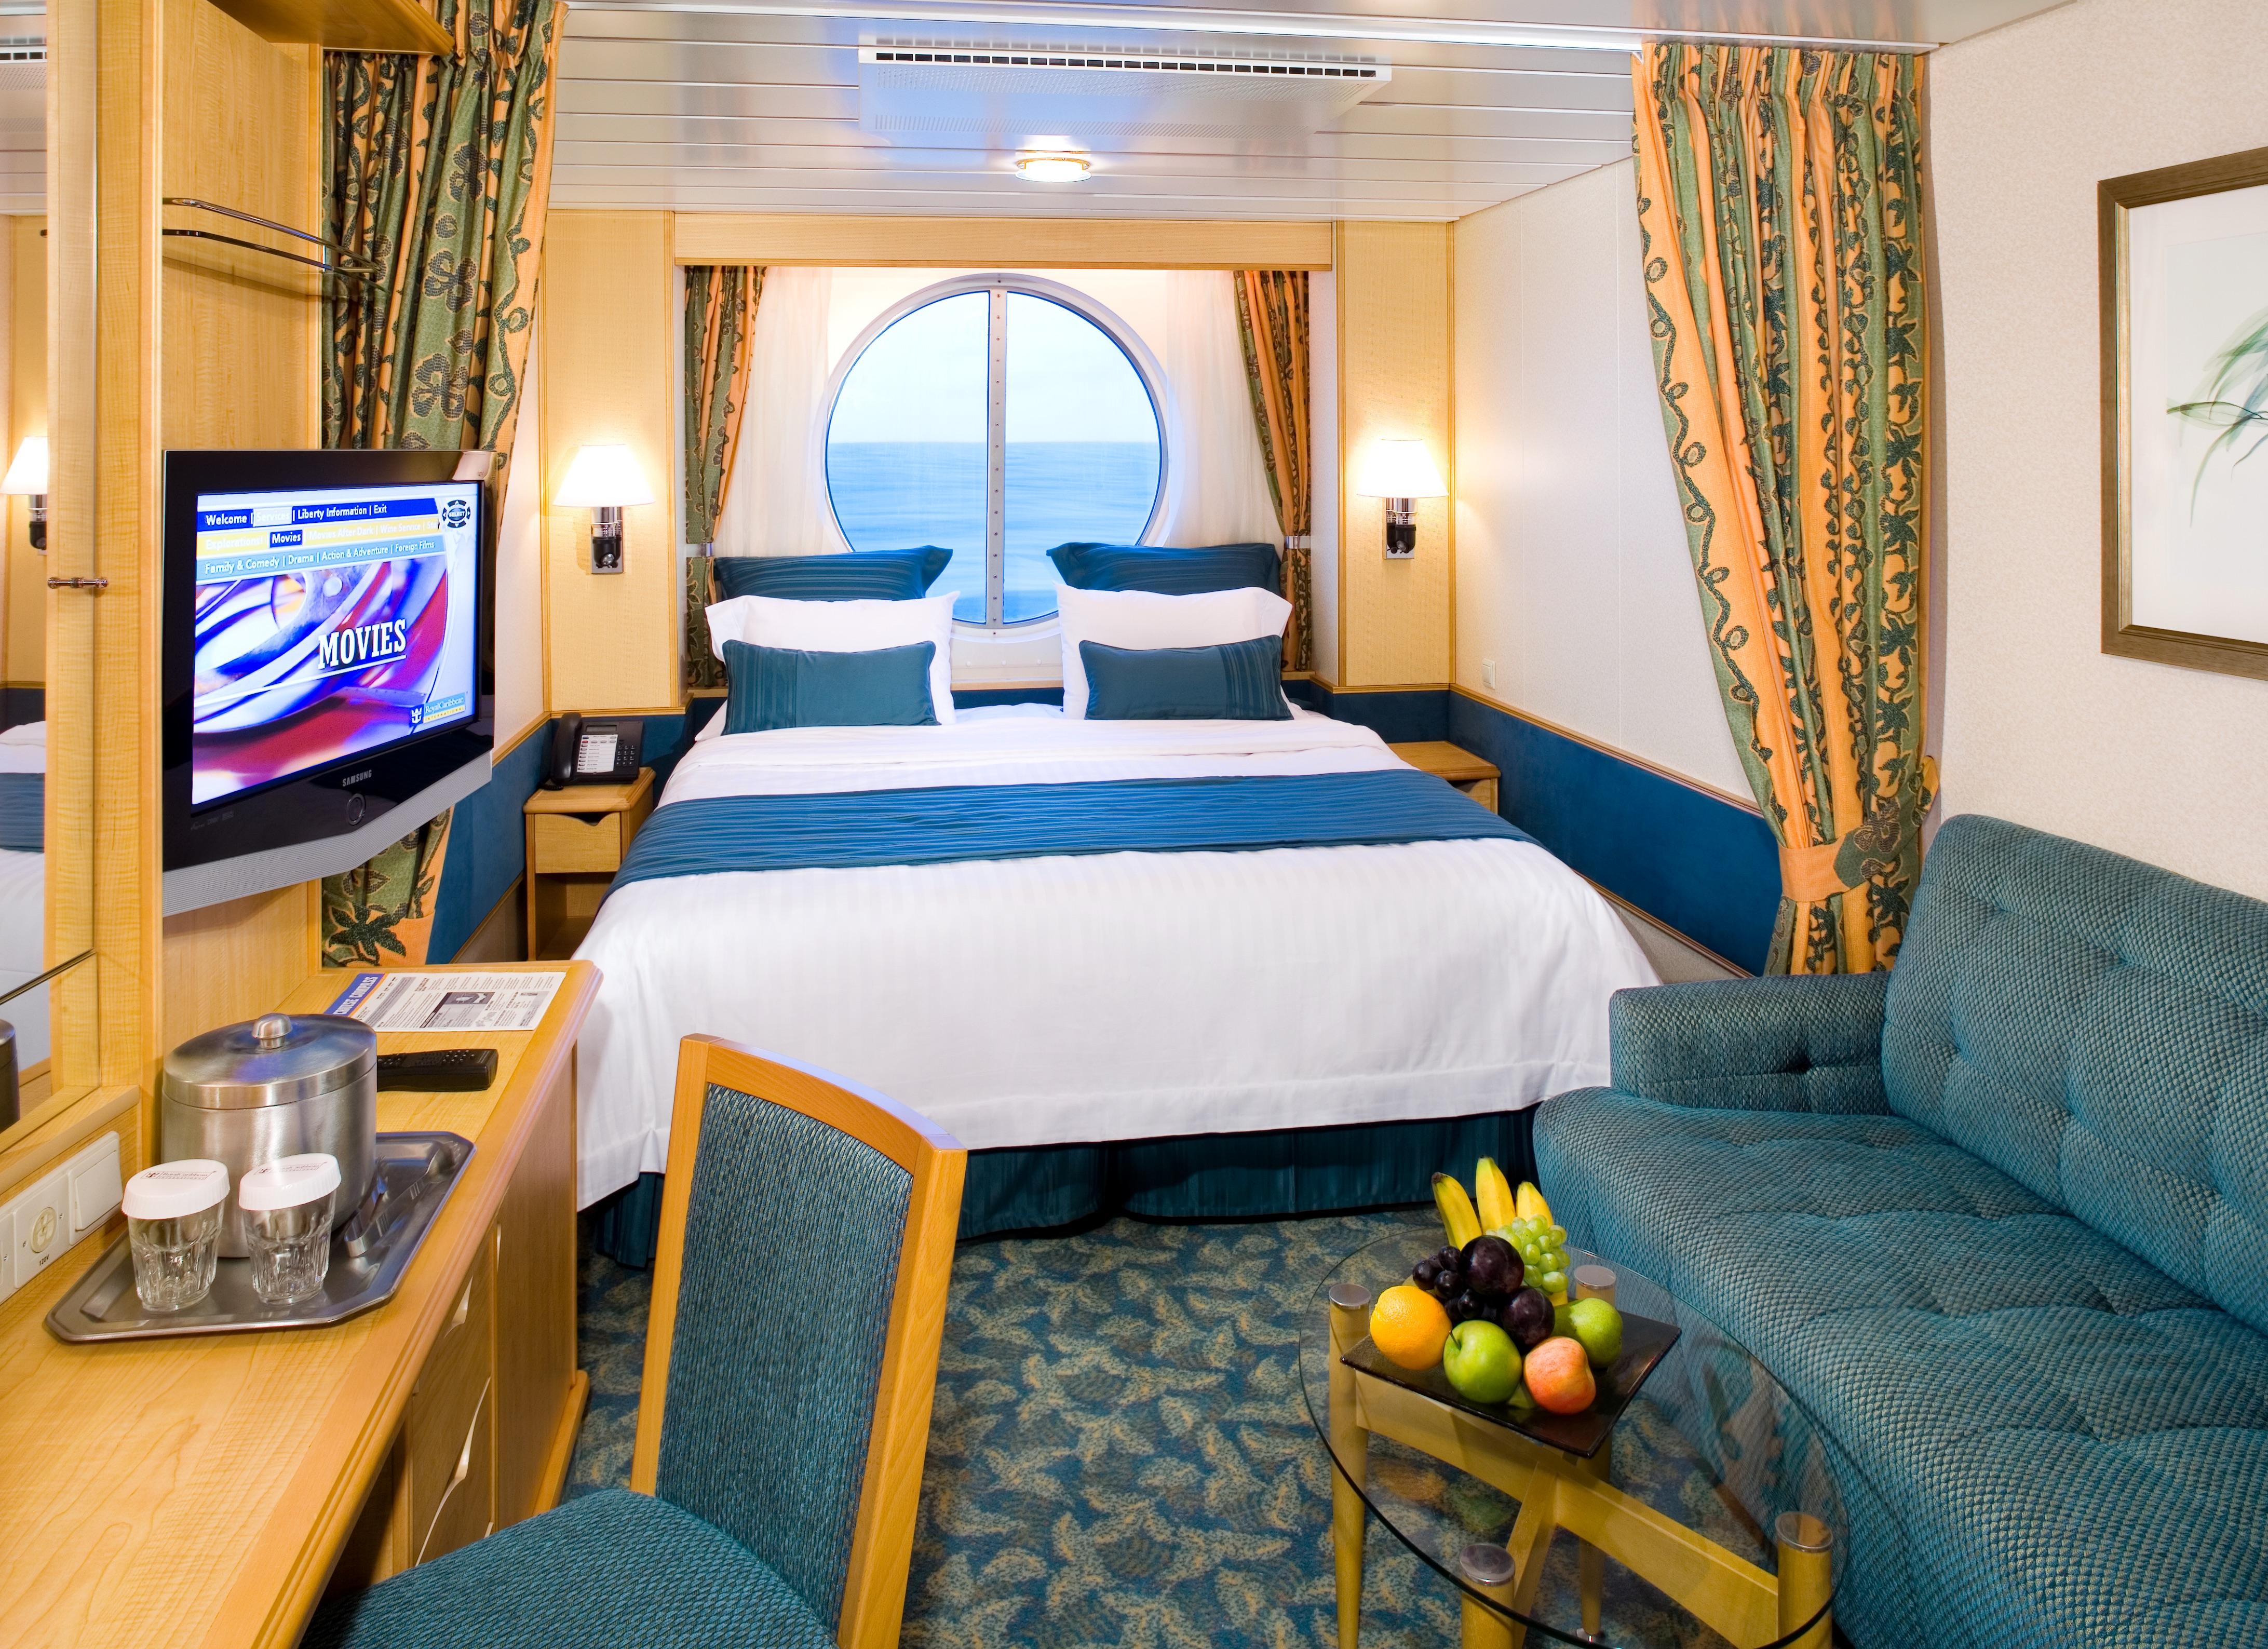 Royal Caribbean International Liberty of the seas Accommodation RCI_LB_Oceanview Cat_F.jpeg